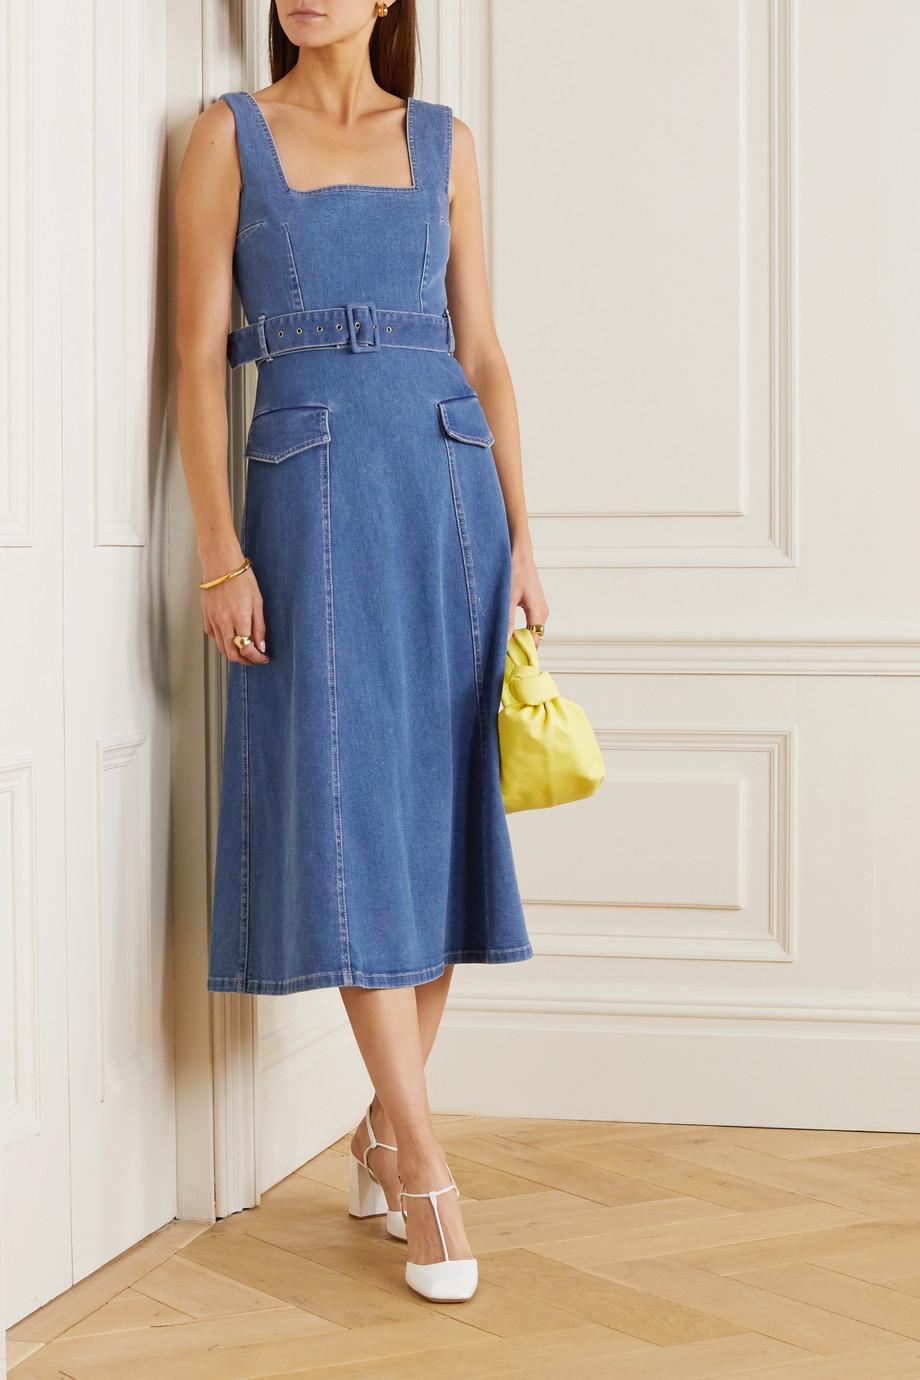 Emilia Wickstead Petra belted stretch-denim midi dress